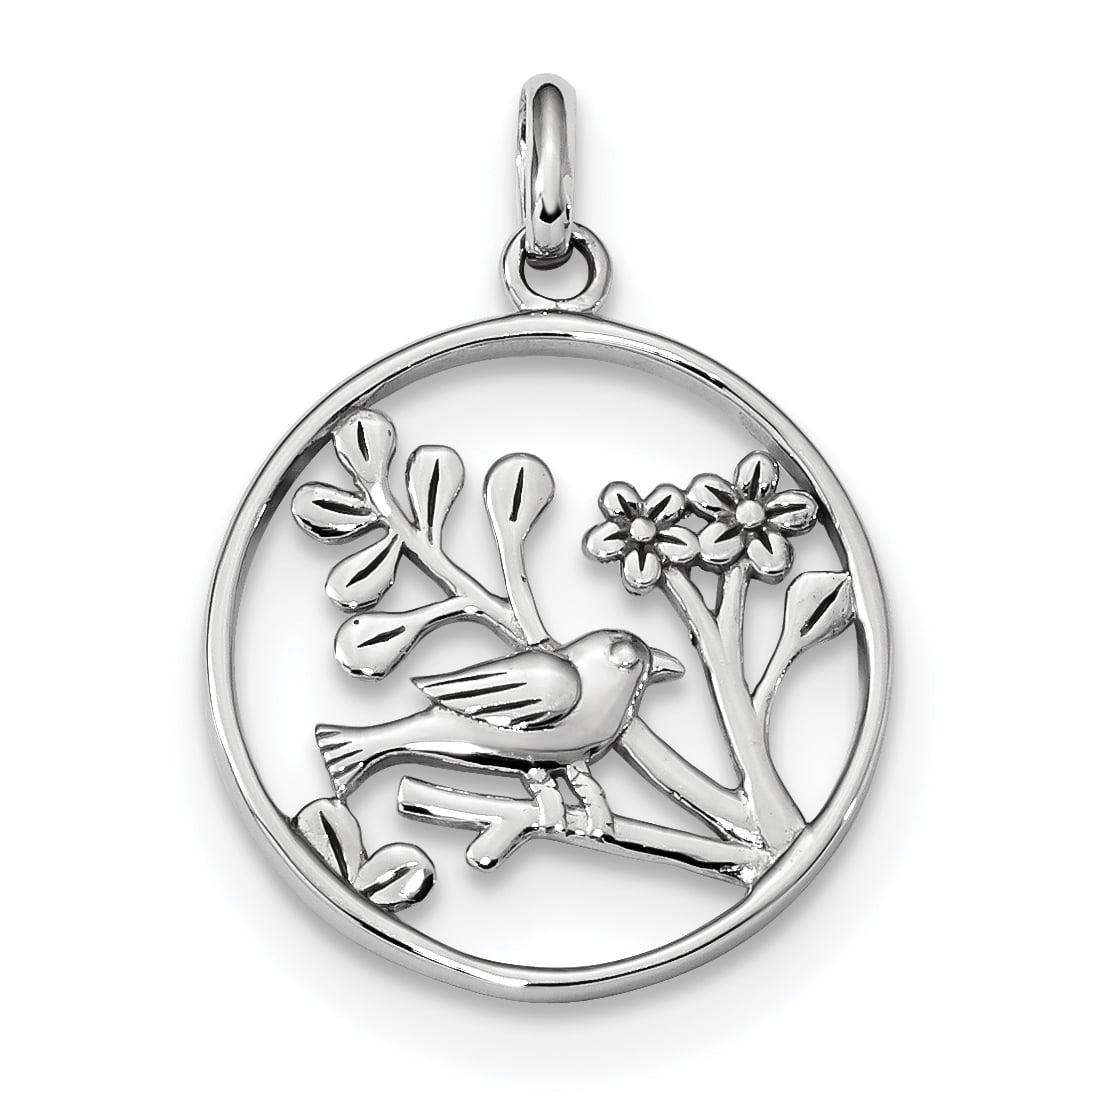 925 Sterling Silver Bird Flowers Pendant Charm Necklace Flower Gardening